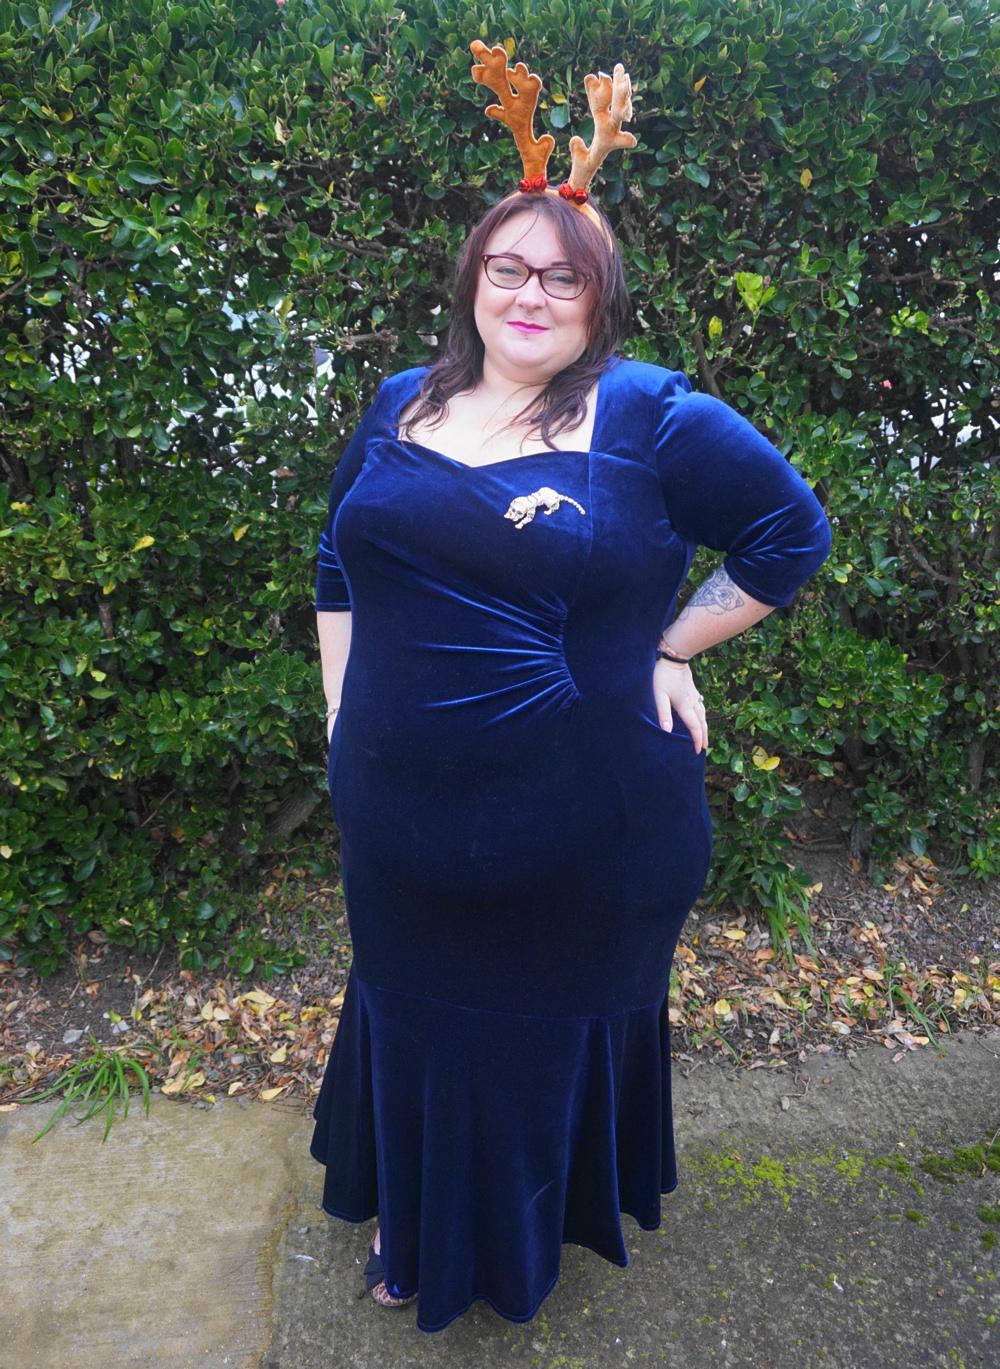 Scarlett and Jo Fishtail Velvet Maxi Dress in Midnight, deep navy plus size dress occasion dress Christmas dress party dress ball gown